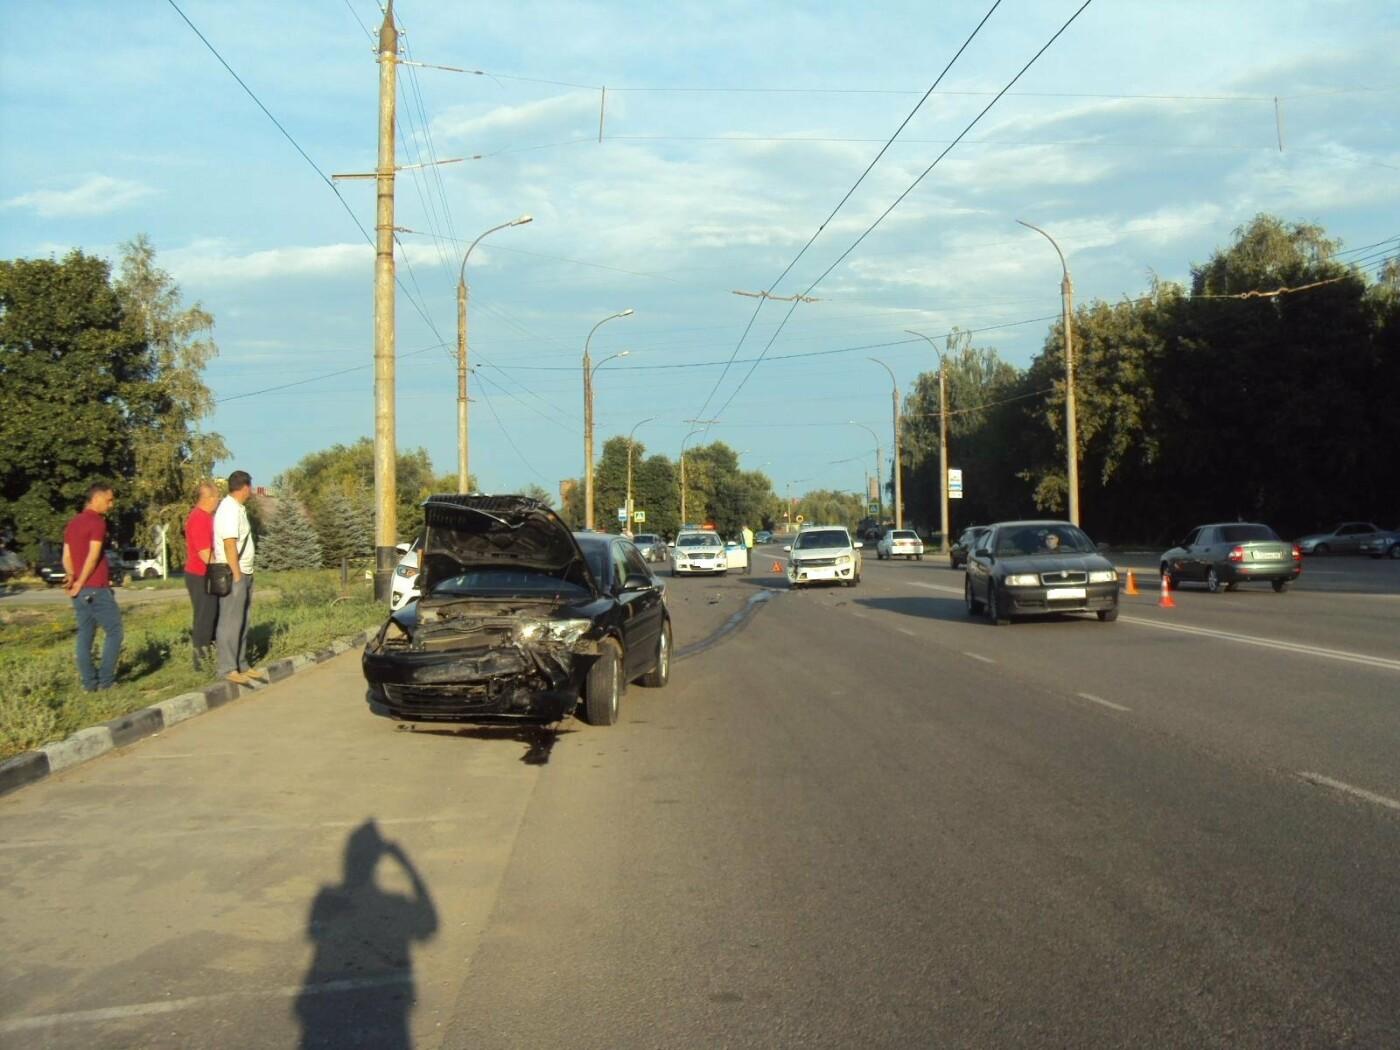 7-летняя тамбовчанка пострадала в аварии на улице Бастионной, фото-1